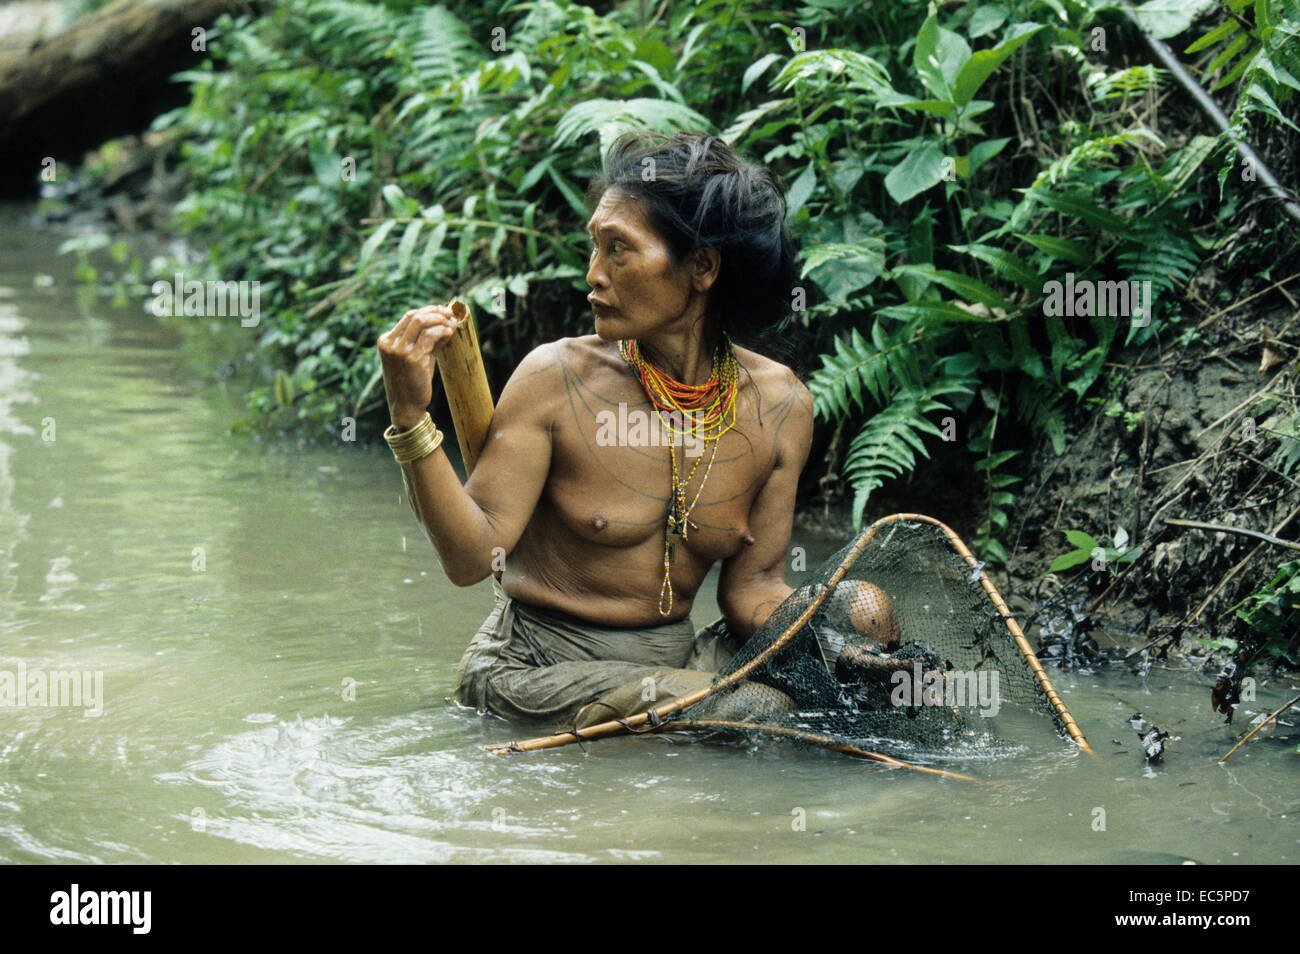 Mentawai woman while fishing, Mentawai Islands, Indonesia - Stock Image